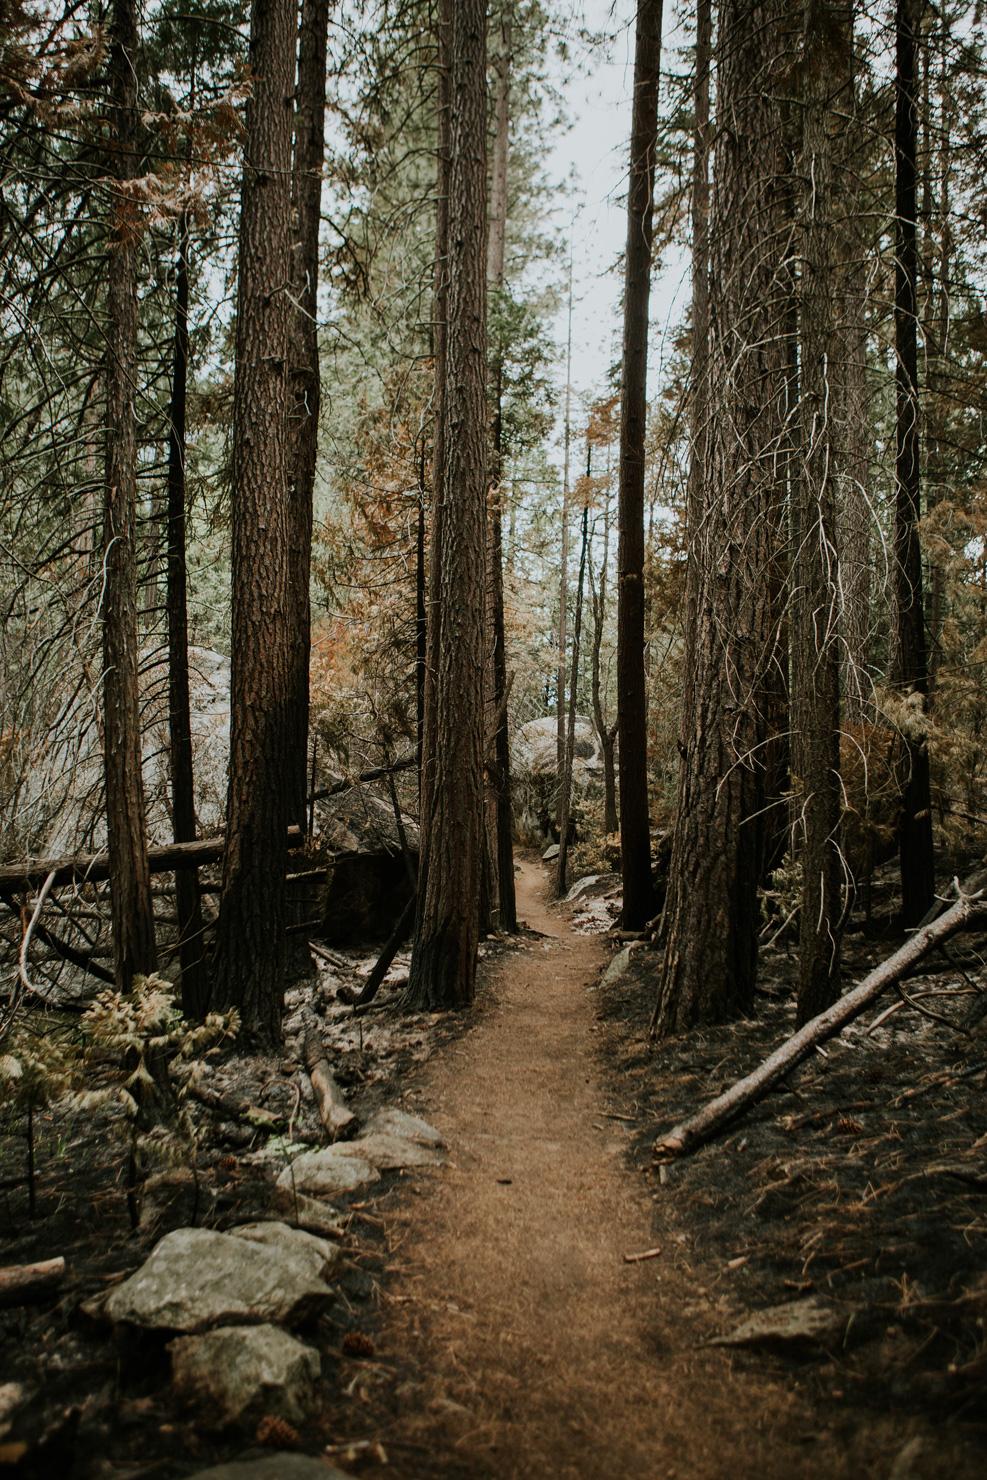 CindyGiovagnoli_Sequoia_KingsCanyon_National_Park_California_forest_fire-028.jpg